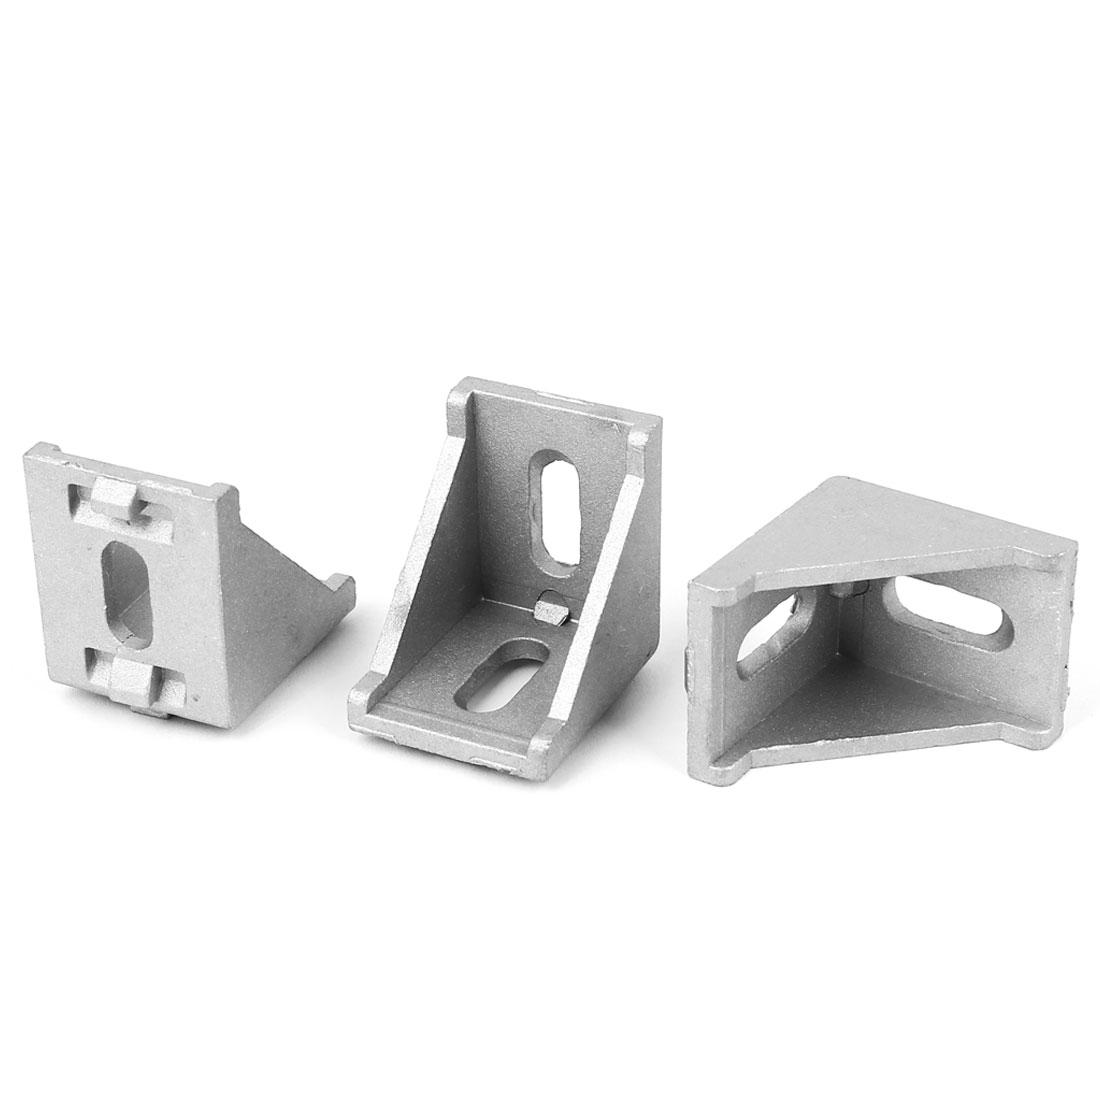 35mmx35x28mm 90 Degree Aluminum Alloy Corner Braces Angle Brackets Supports 3pcs